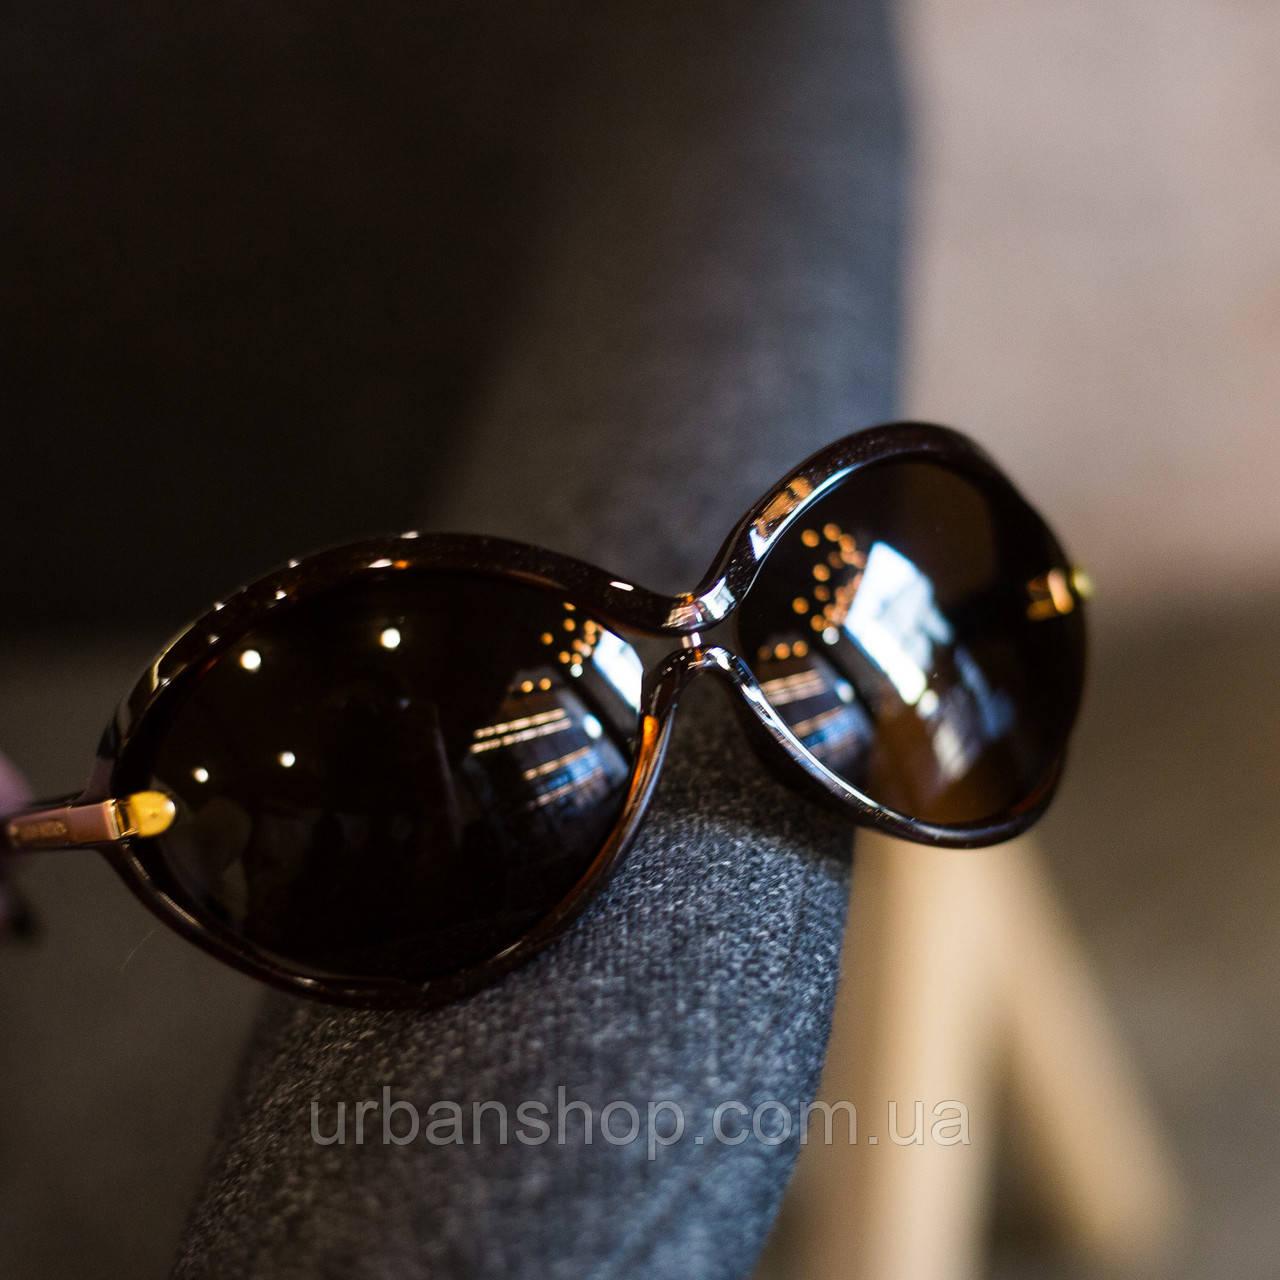 Окуляри Louis Vuitton Louis Vuitton